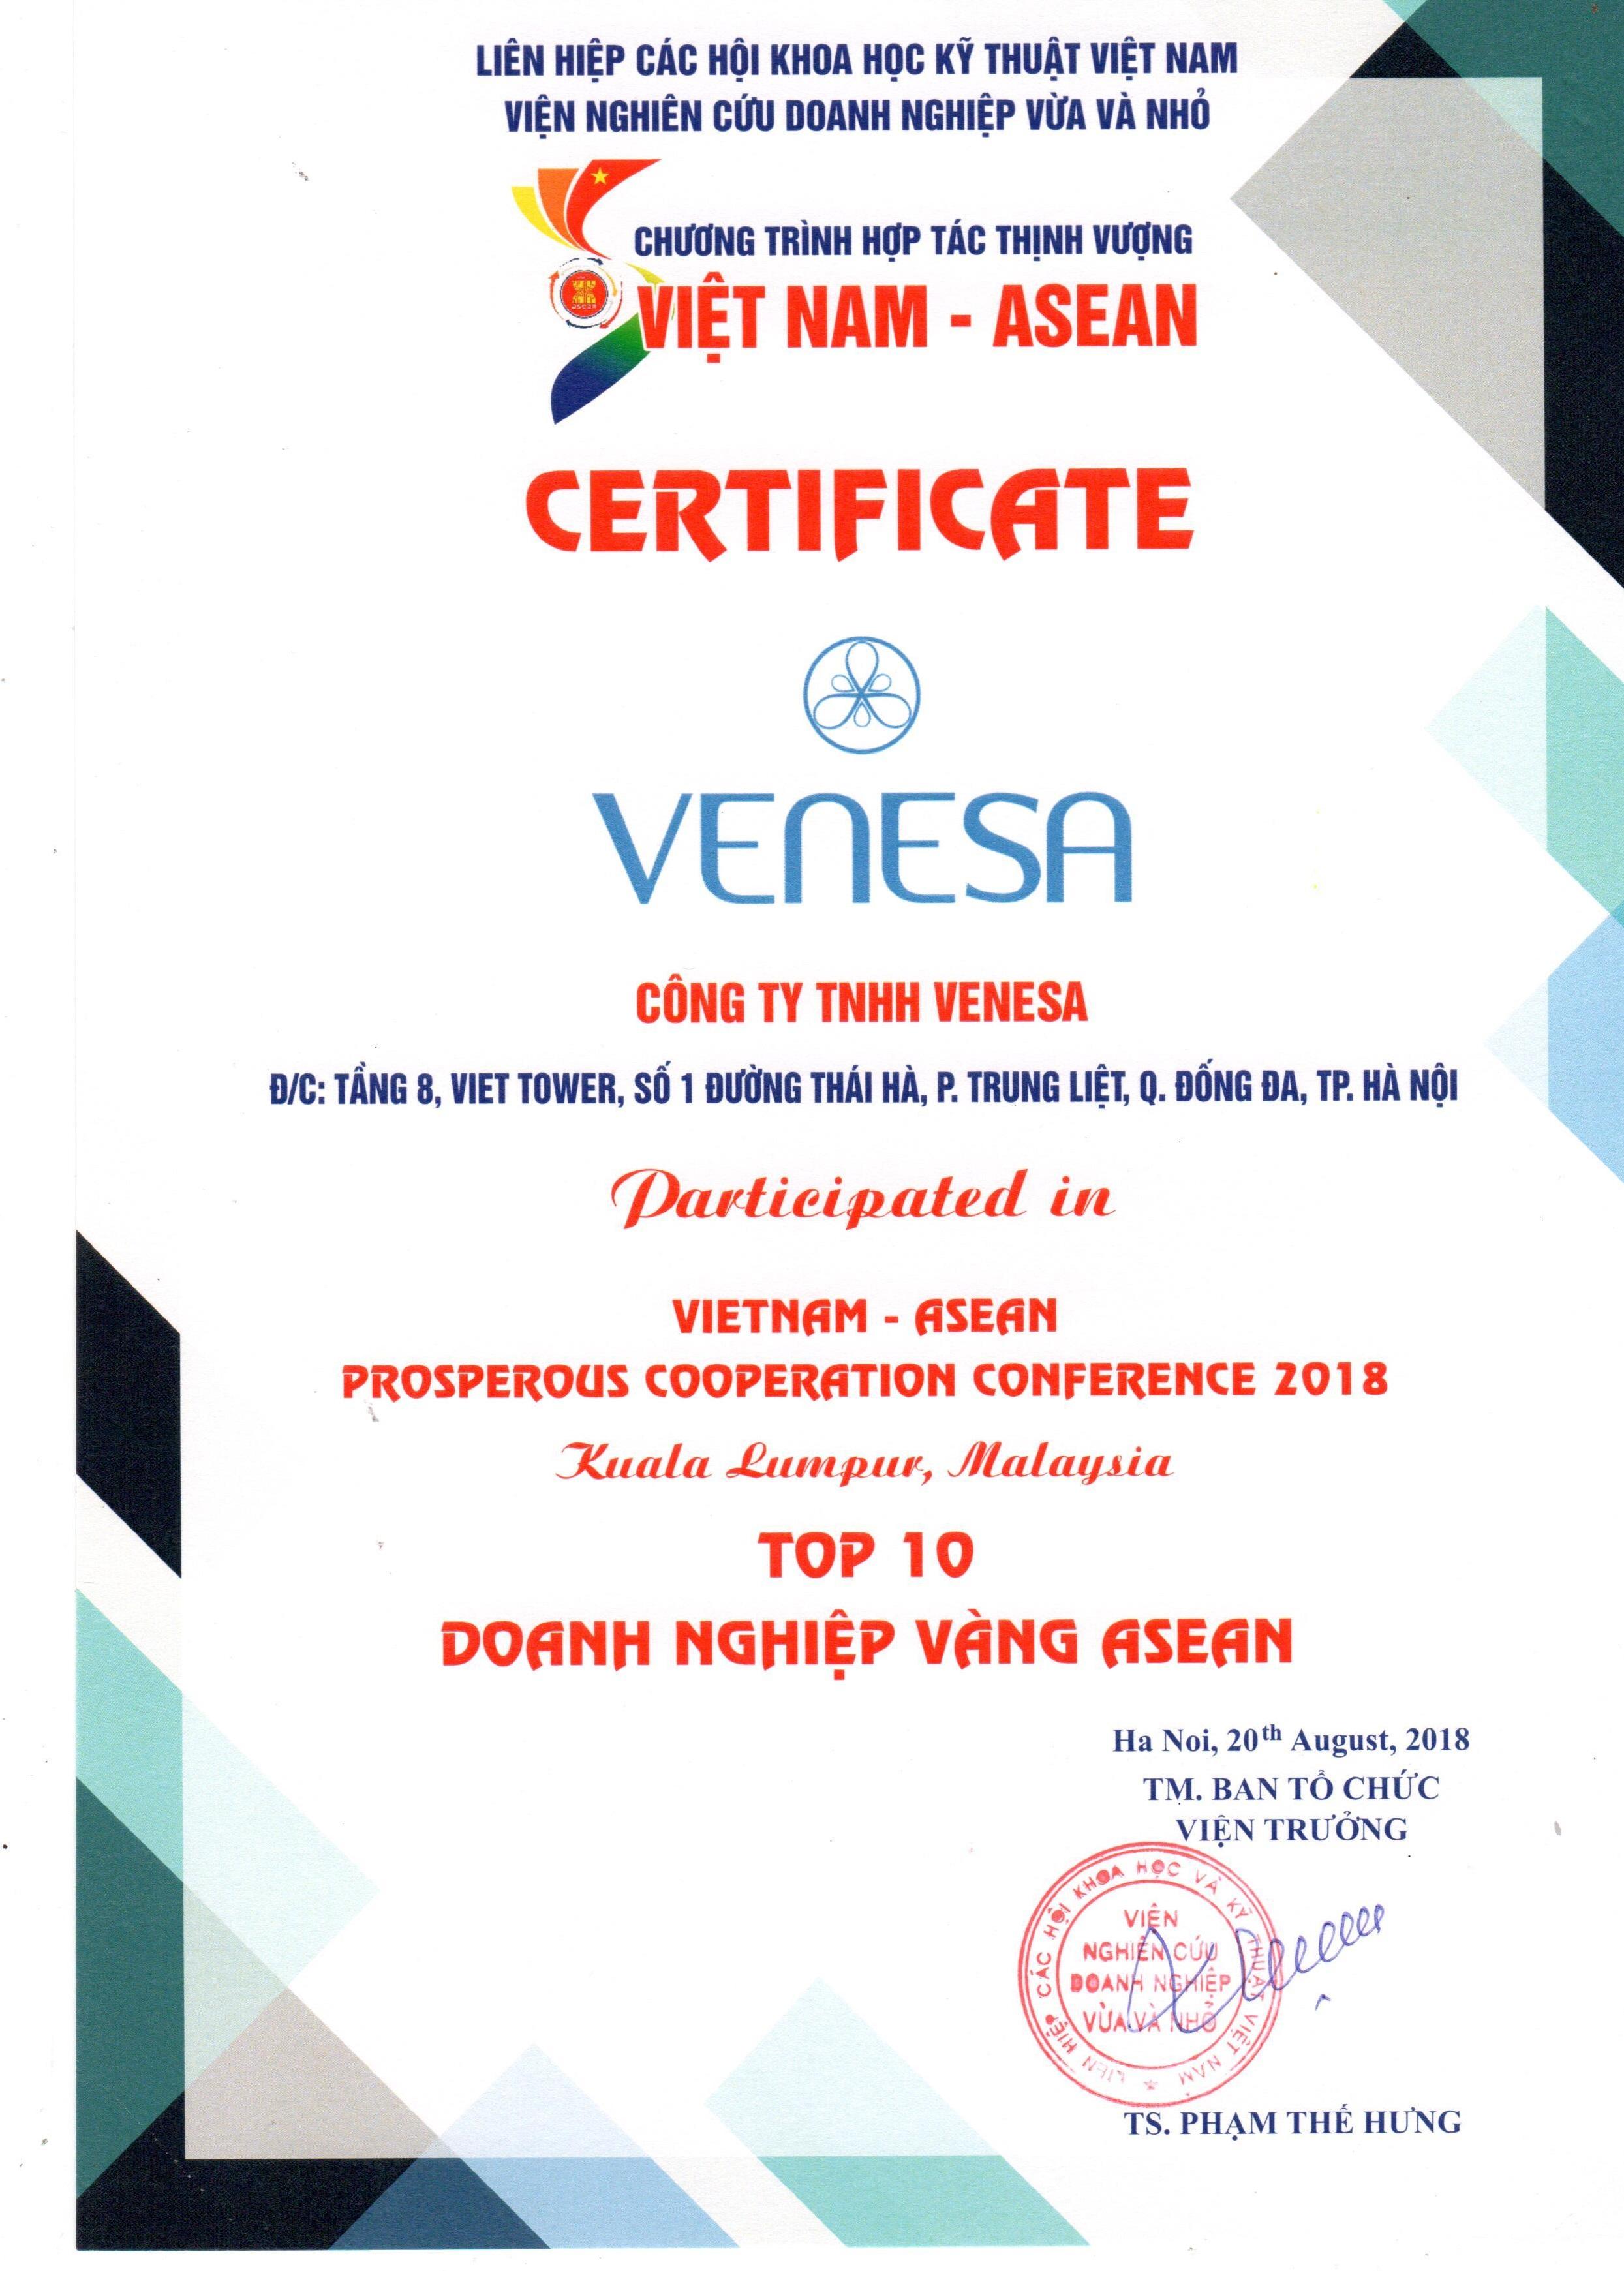 Venesa lọt Top 10 Doanh nghiệp vàng ASEAN